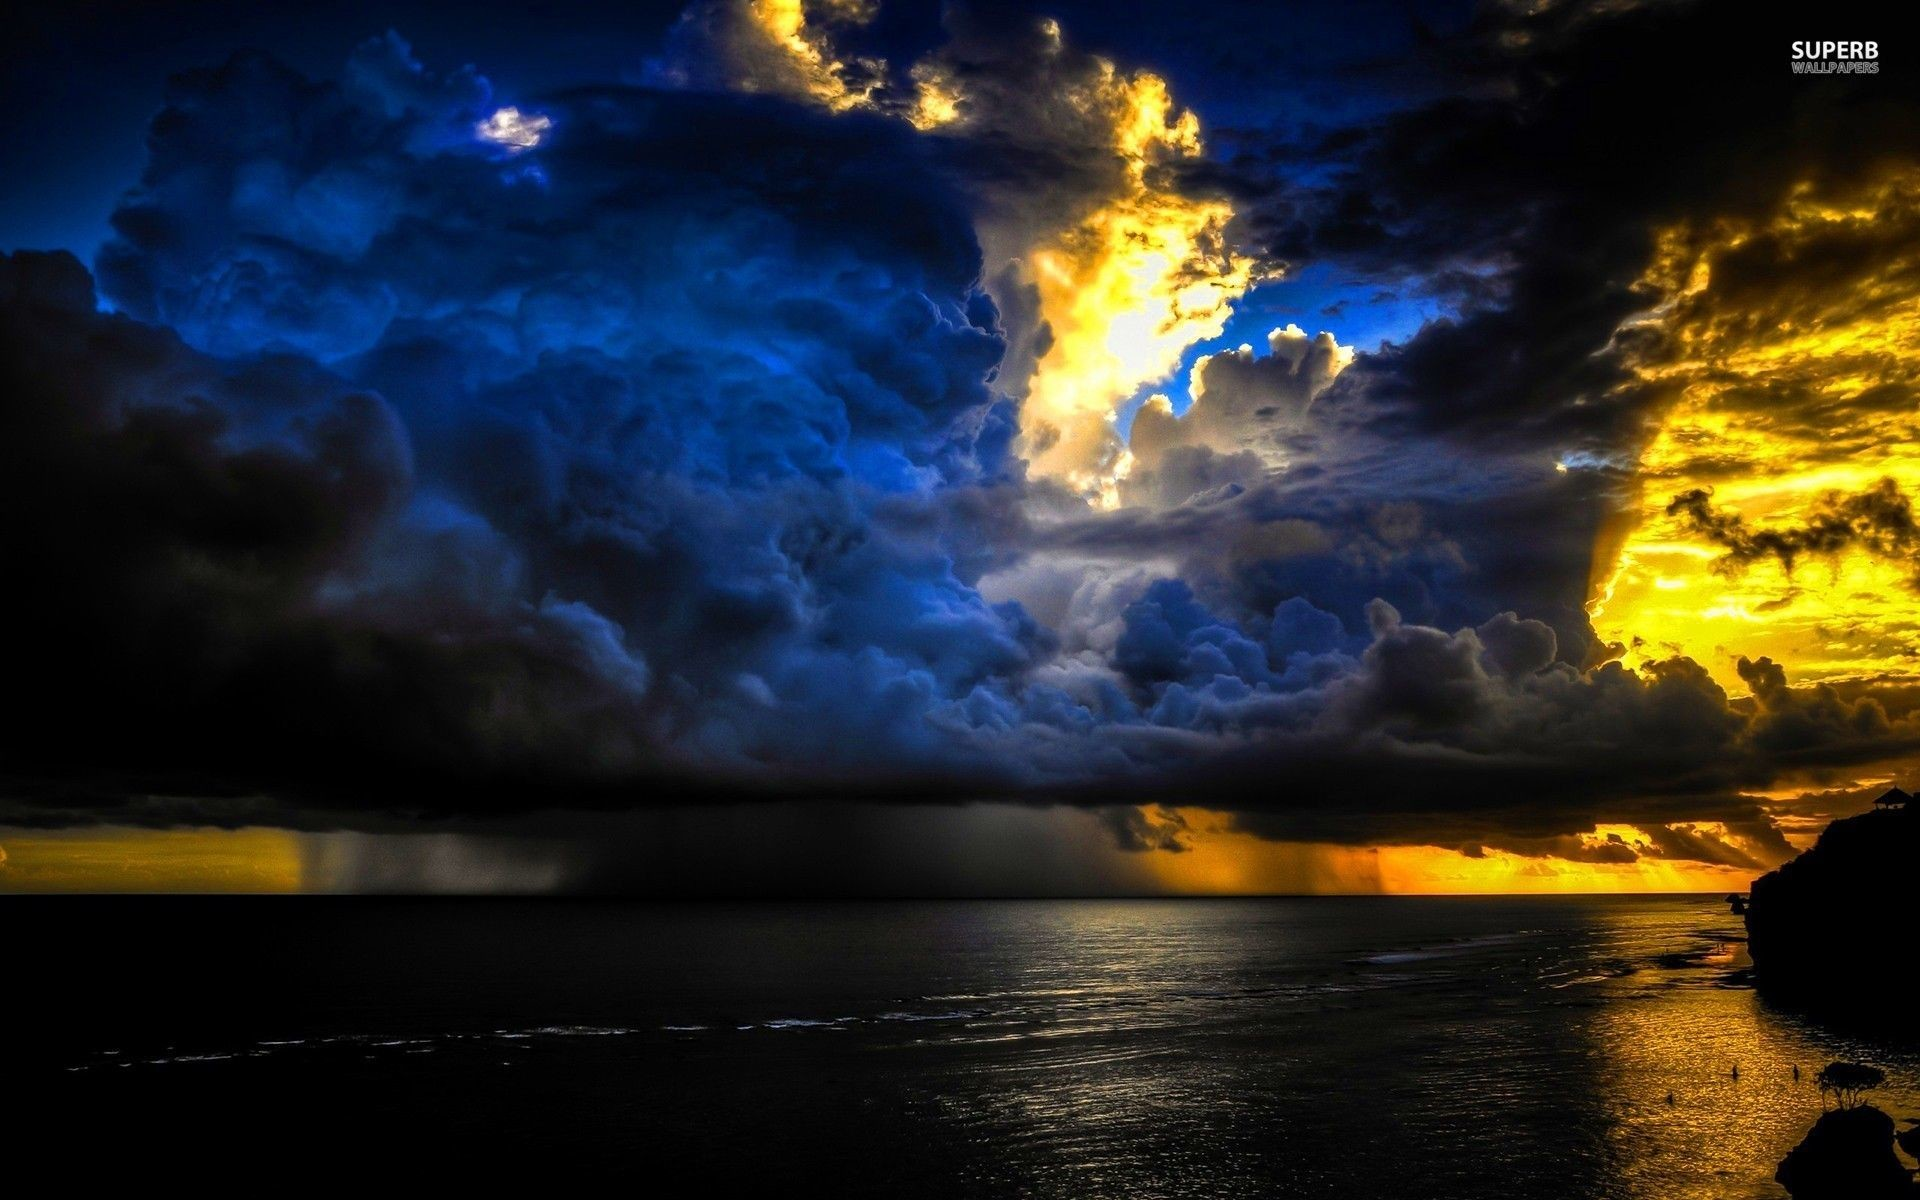 Storm Desktop Wallpaper 62 Images